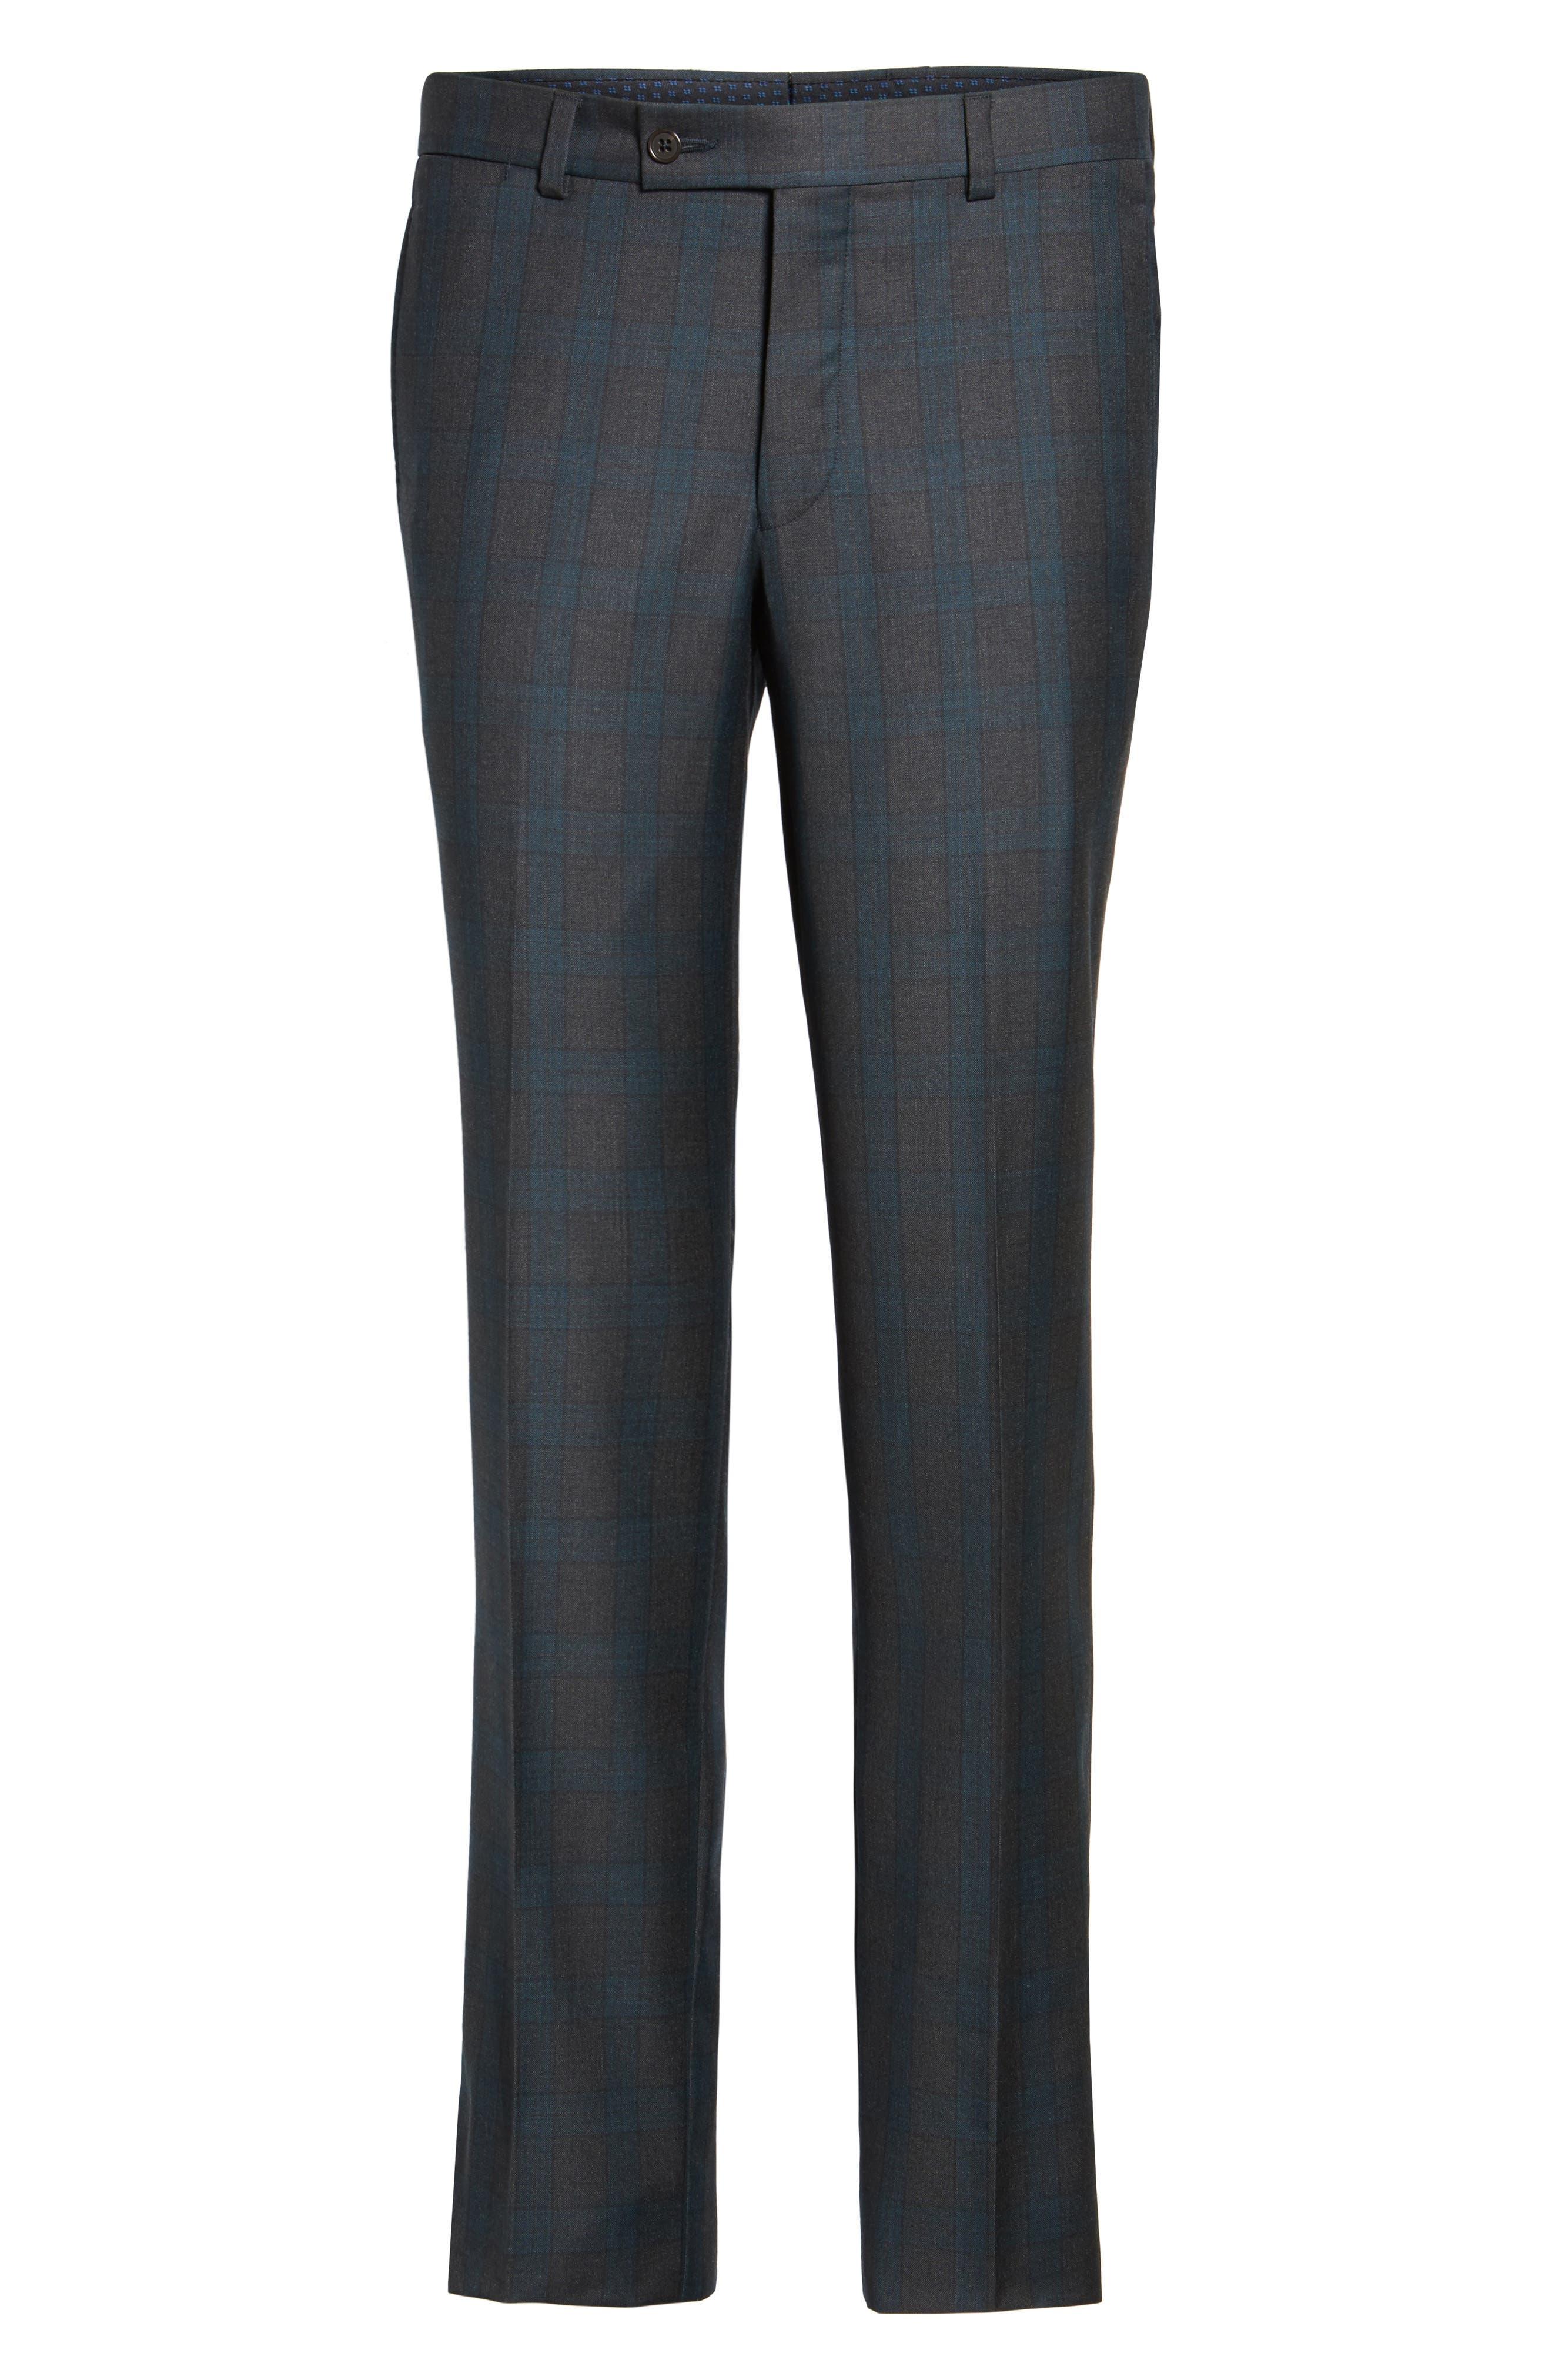 Jefferson Flat Front Plaid Wool Trousers,                             Alternate thumbnail 6, color,                             020